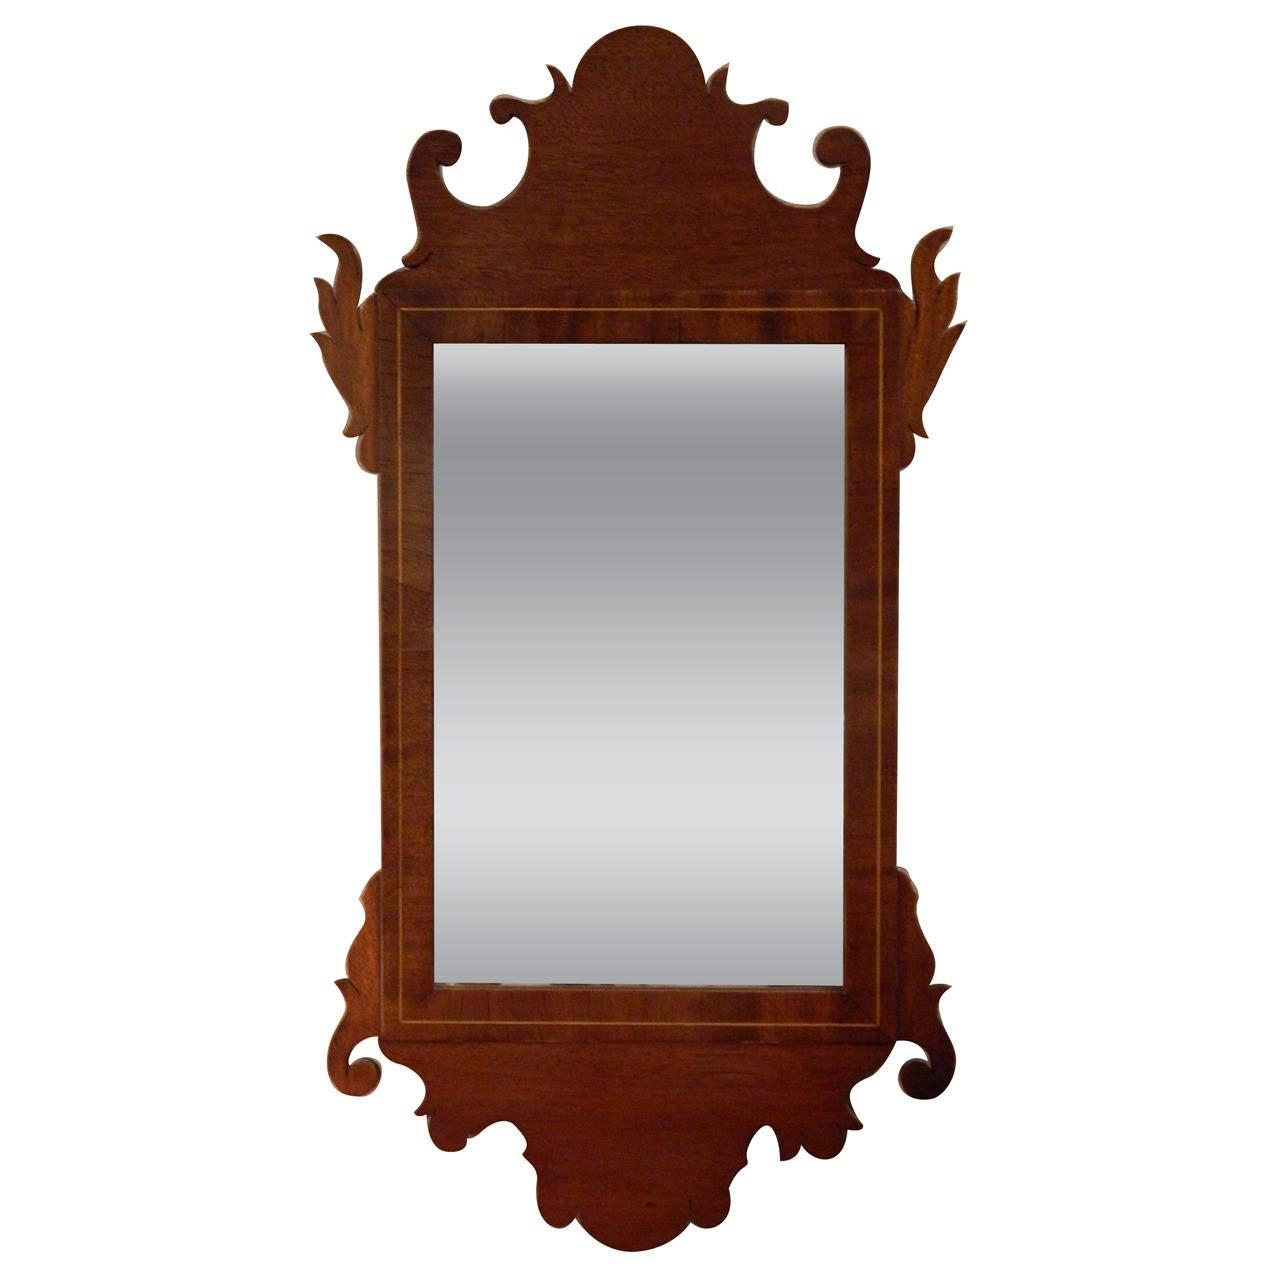 American Federal Inlaid Mahogany Looking Glass Mirror, Circa 1800